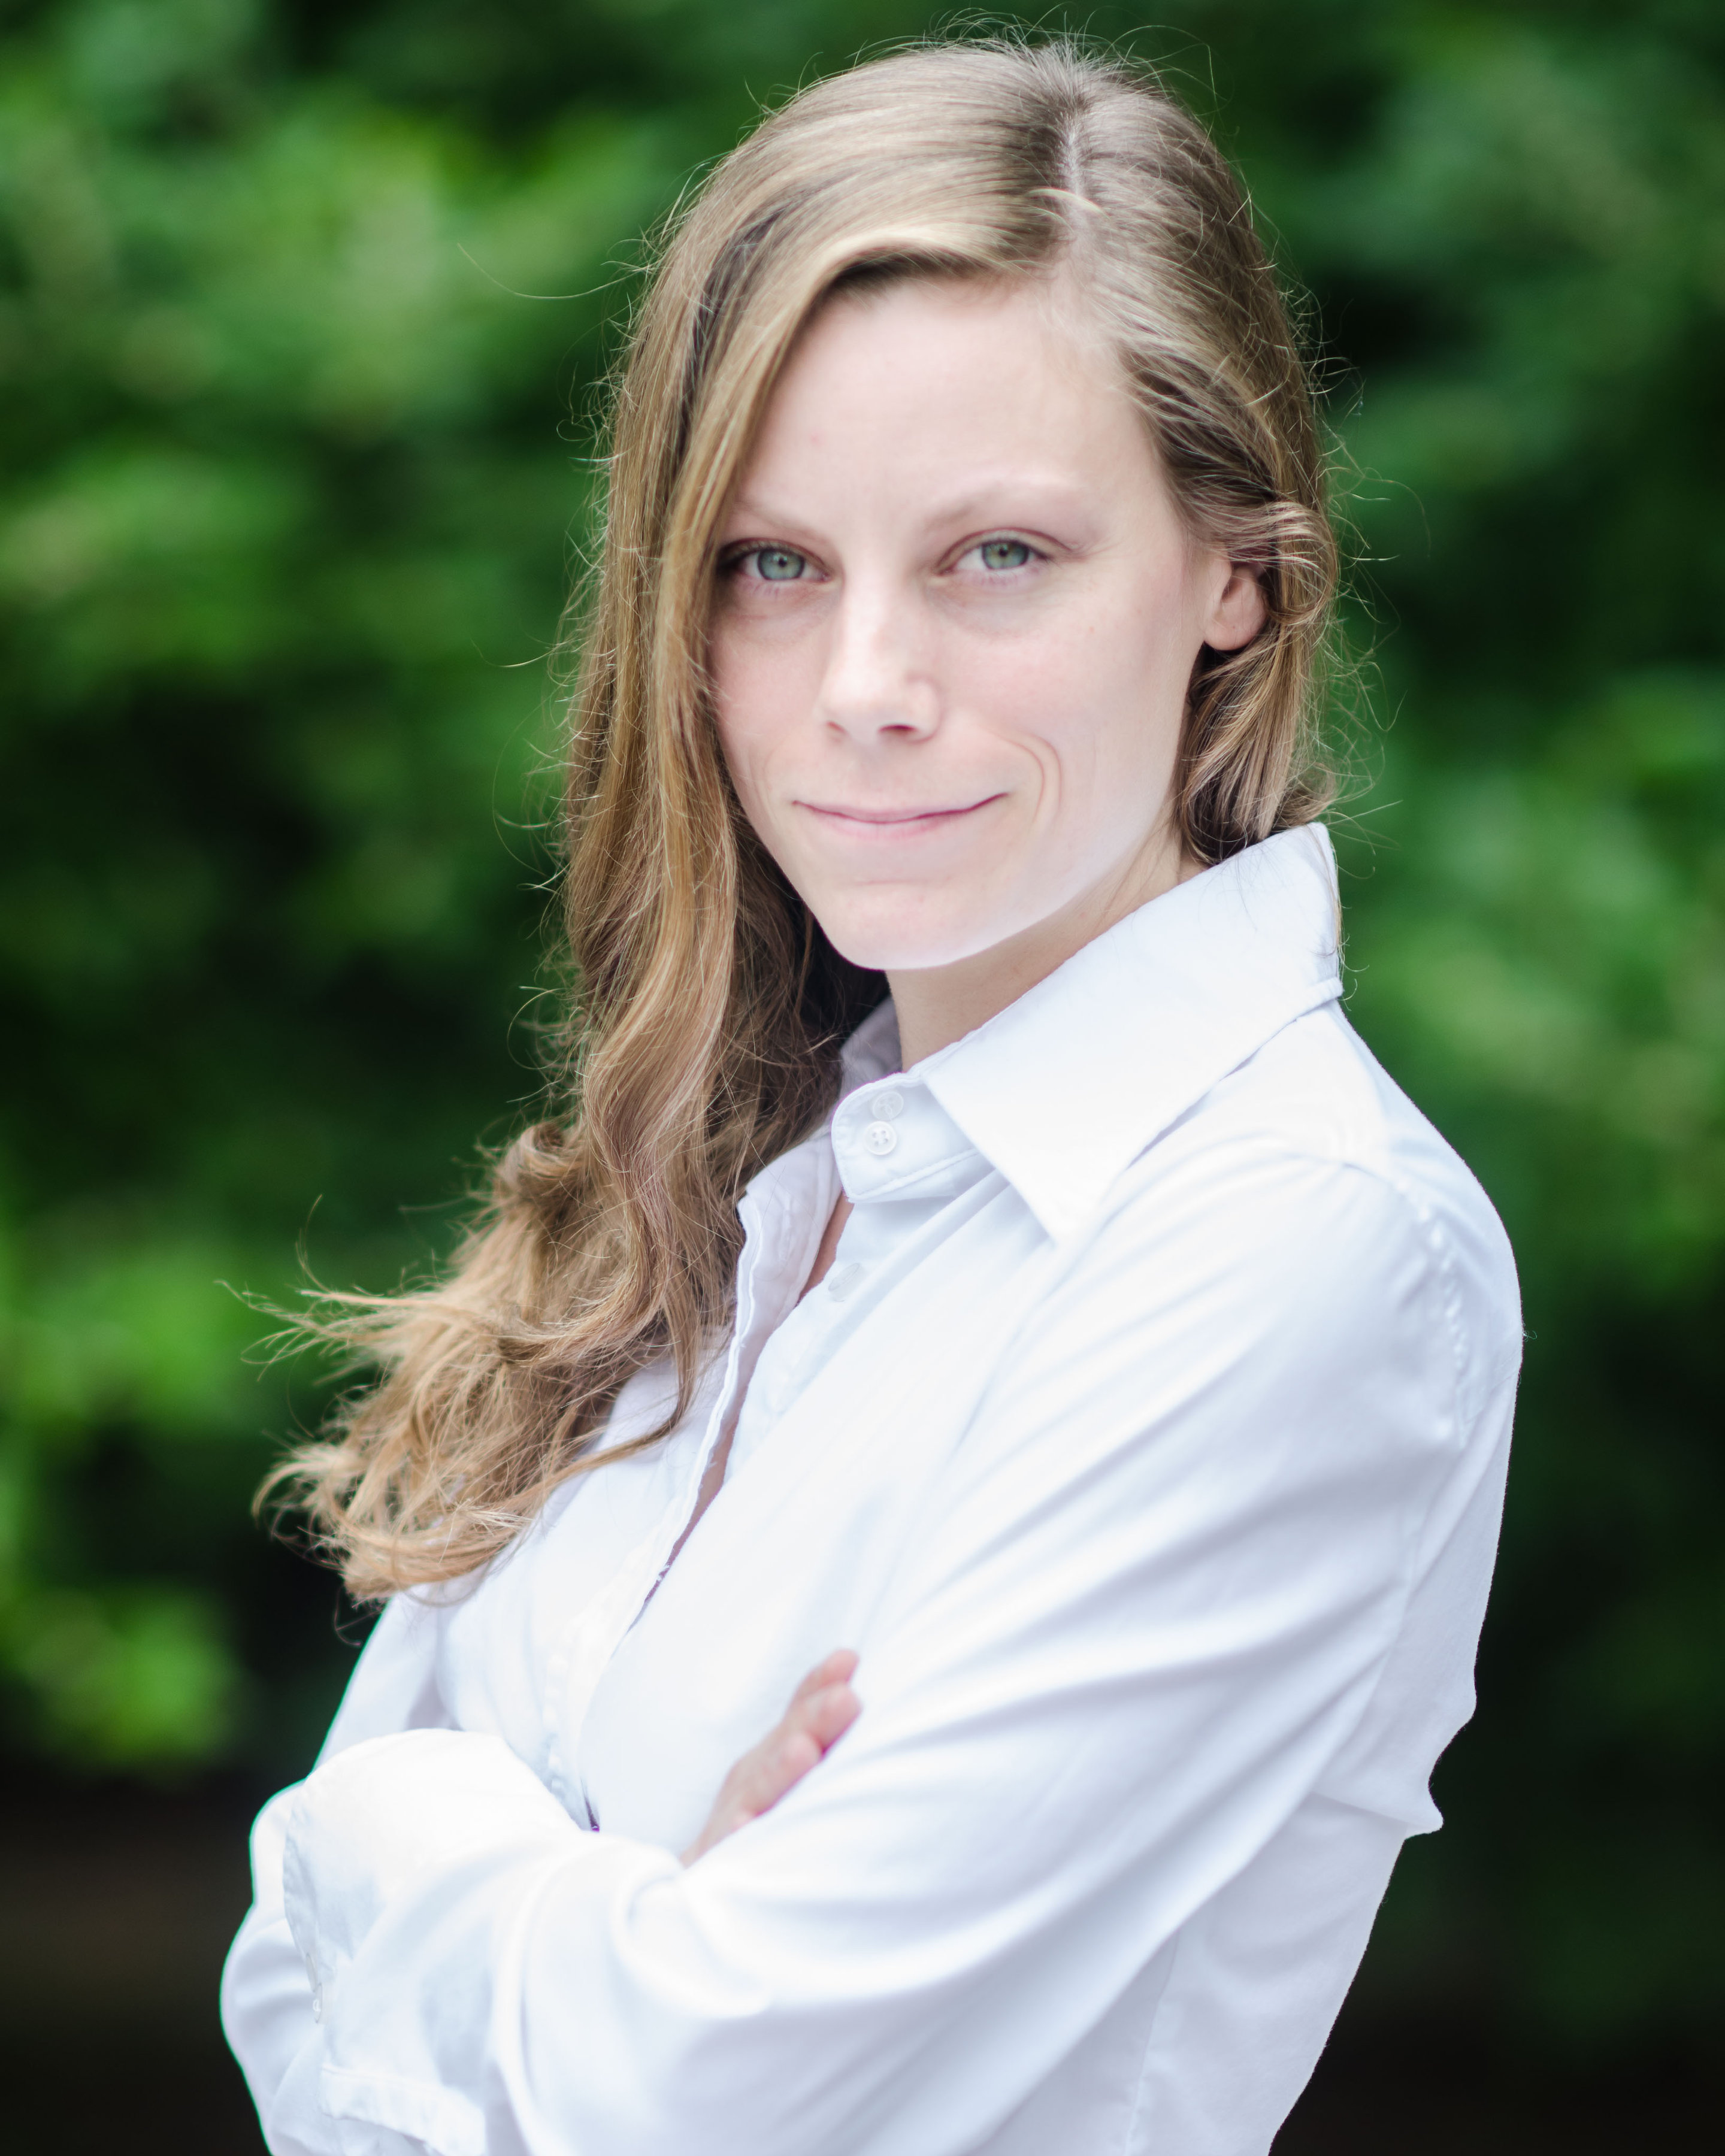 samantha winogrond, cpa new investment advisor in asheville nc.jpg